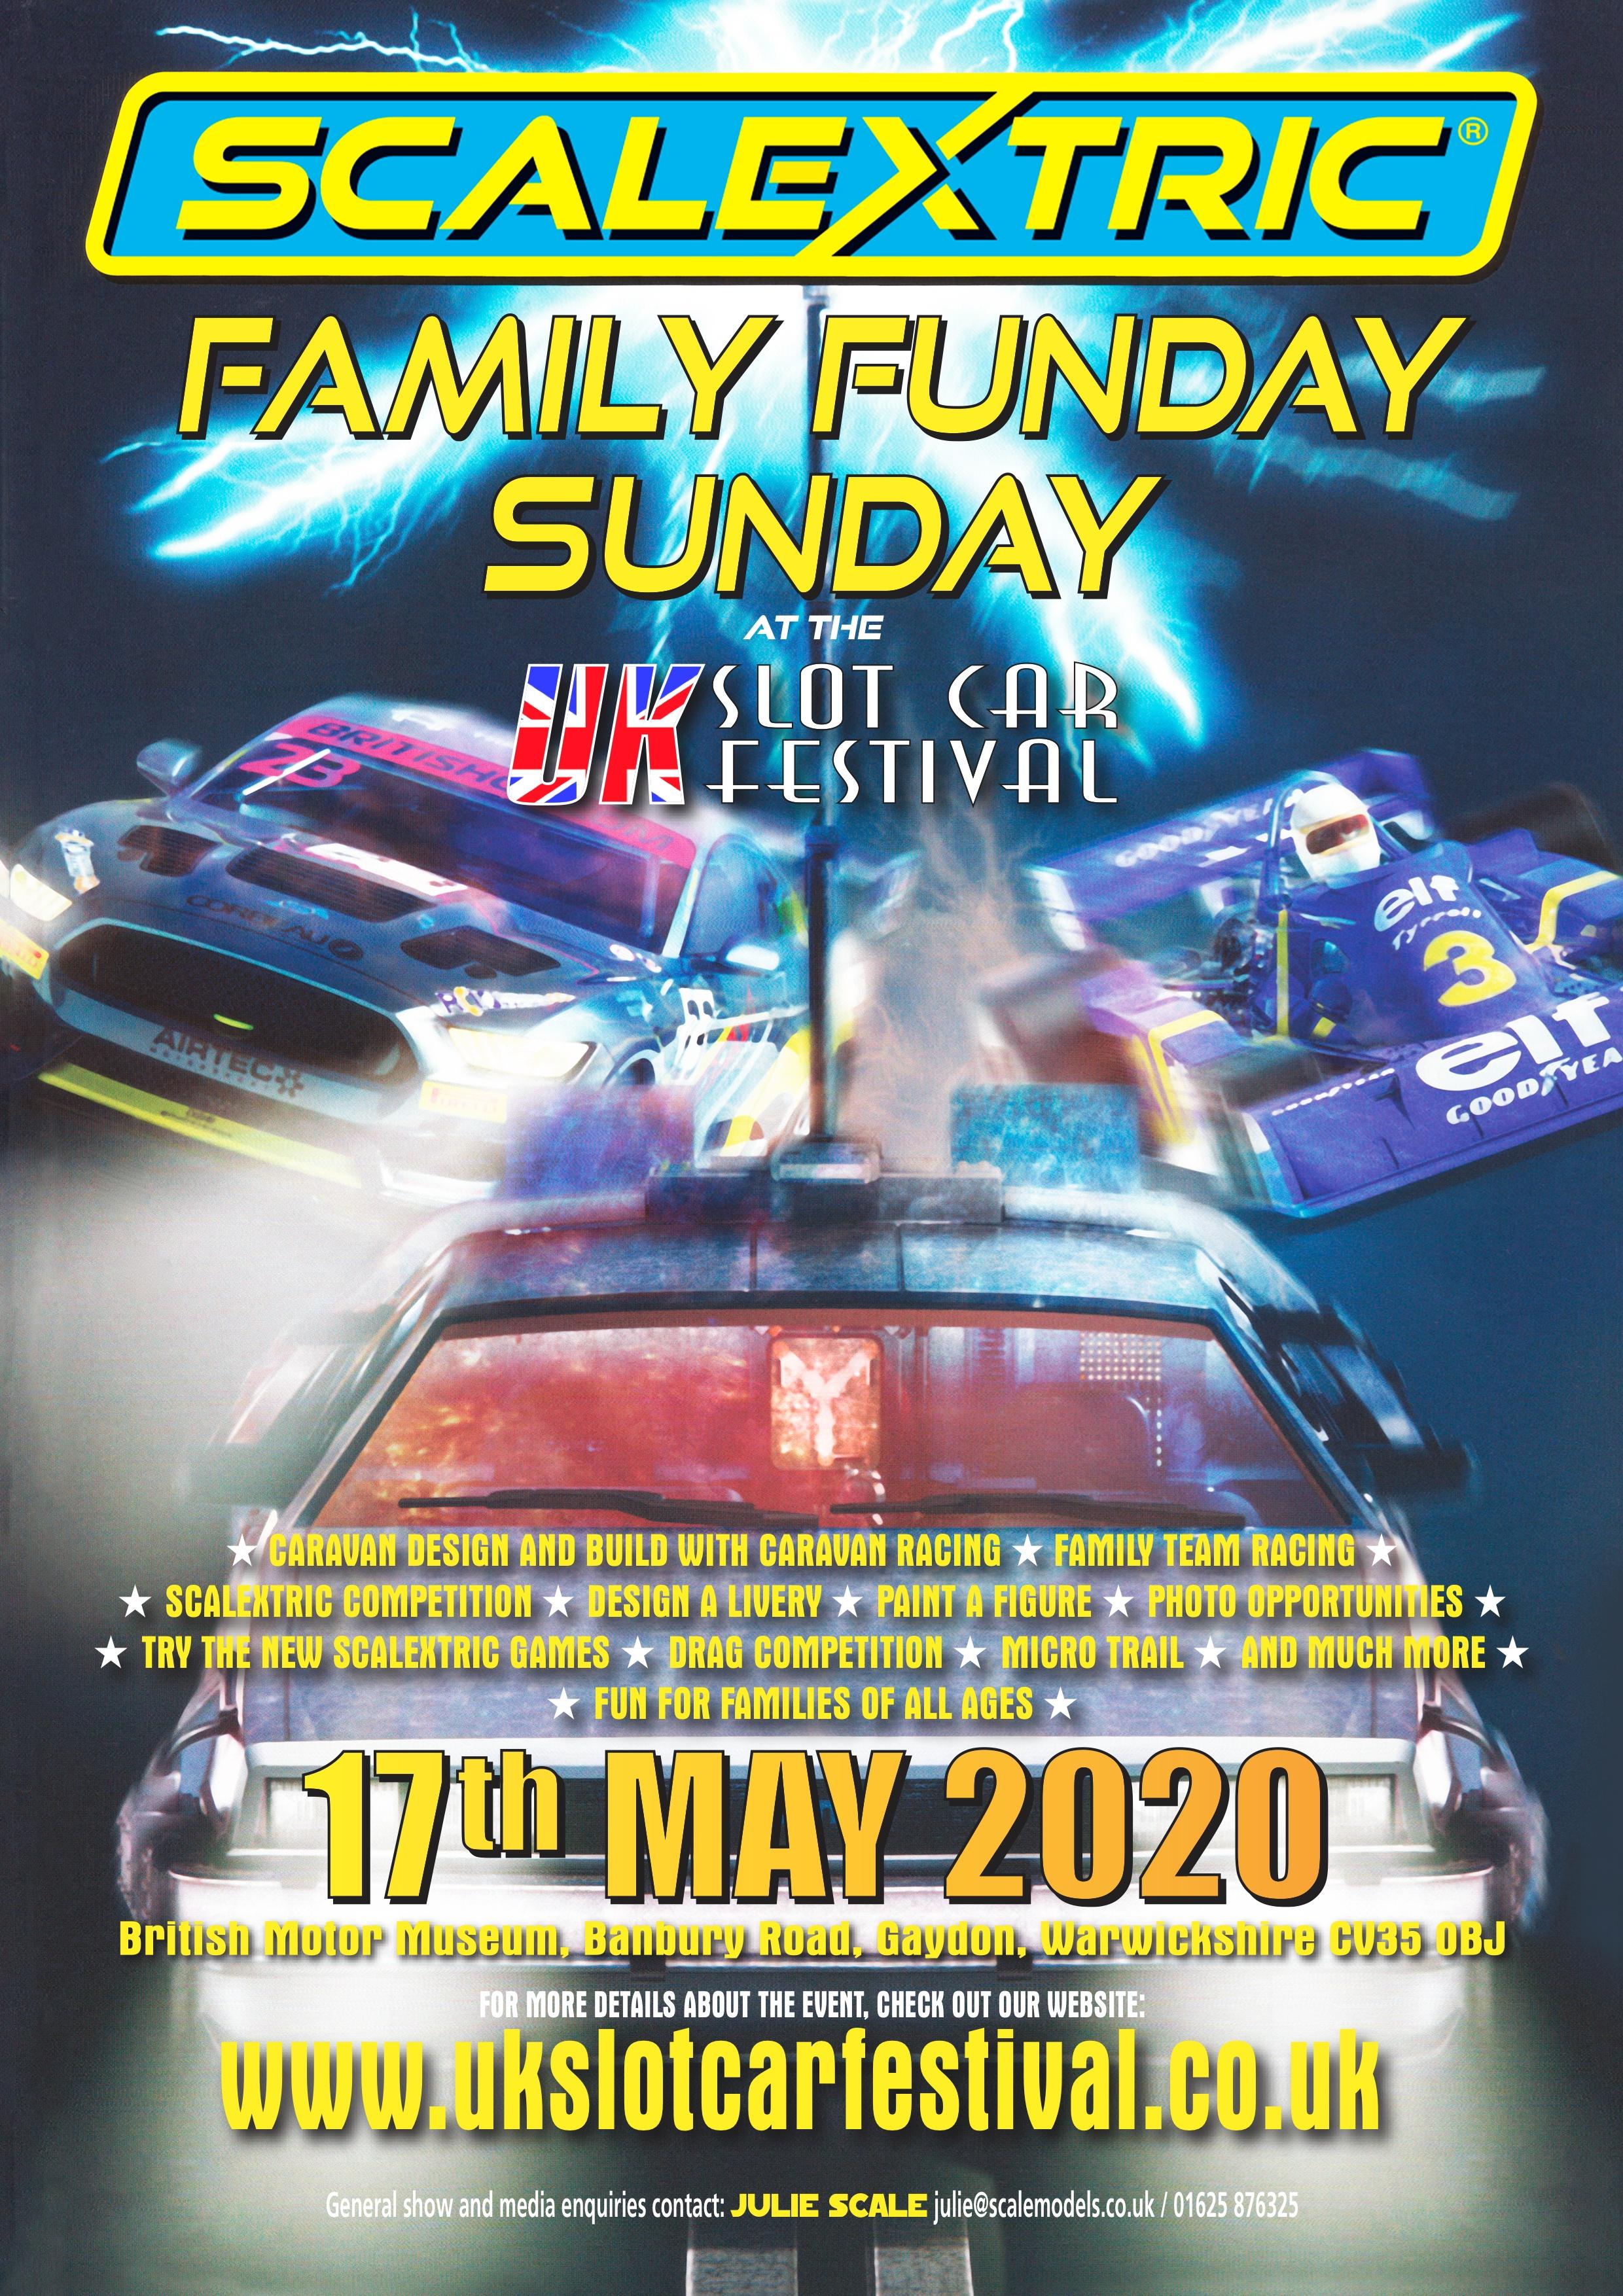 UK-Slot-Car-Festival-Sunday-Flyer-2020